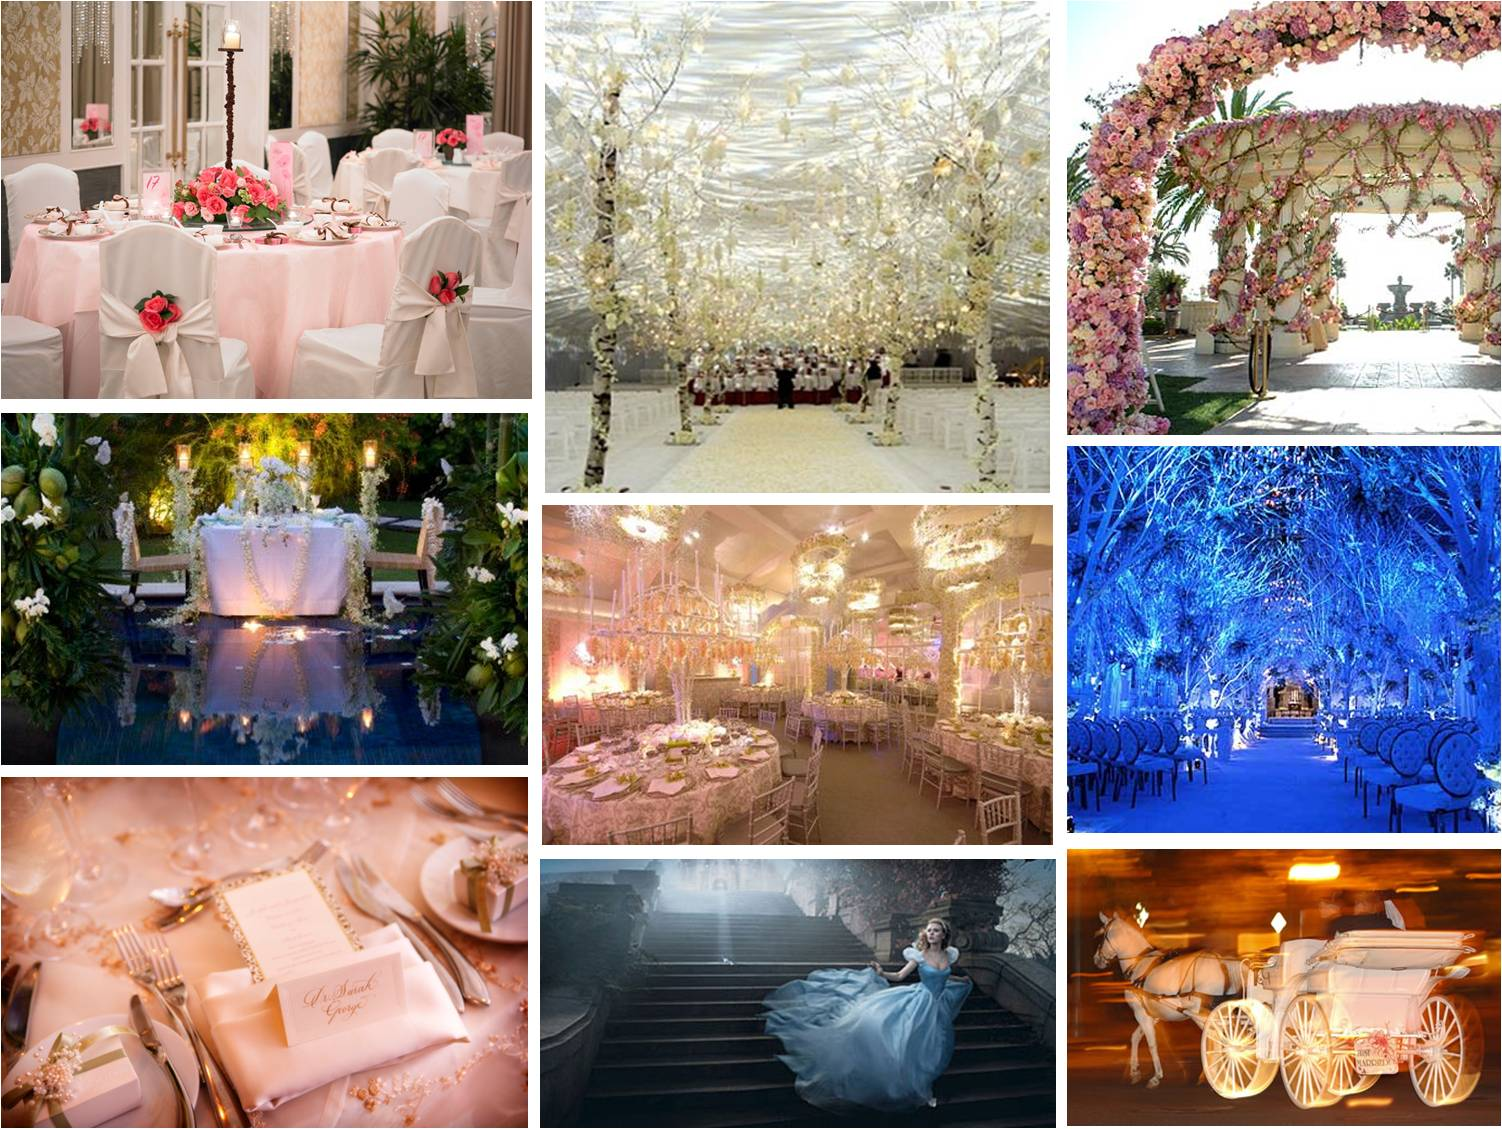 Fairytale Romance Wedding Theme My Riviera Wedding